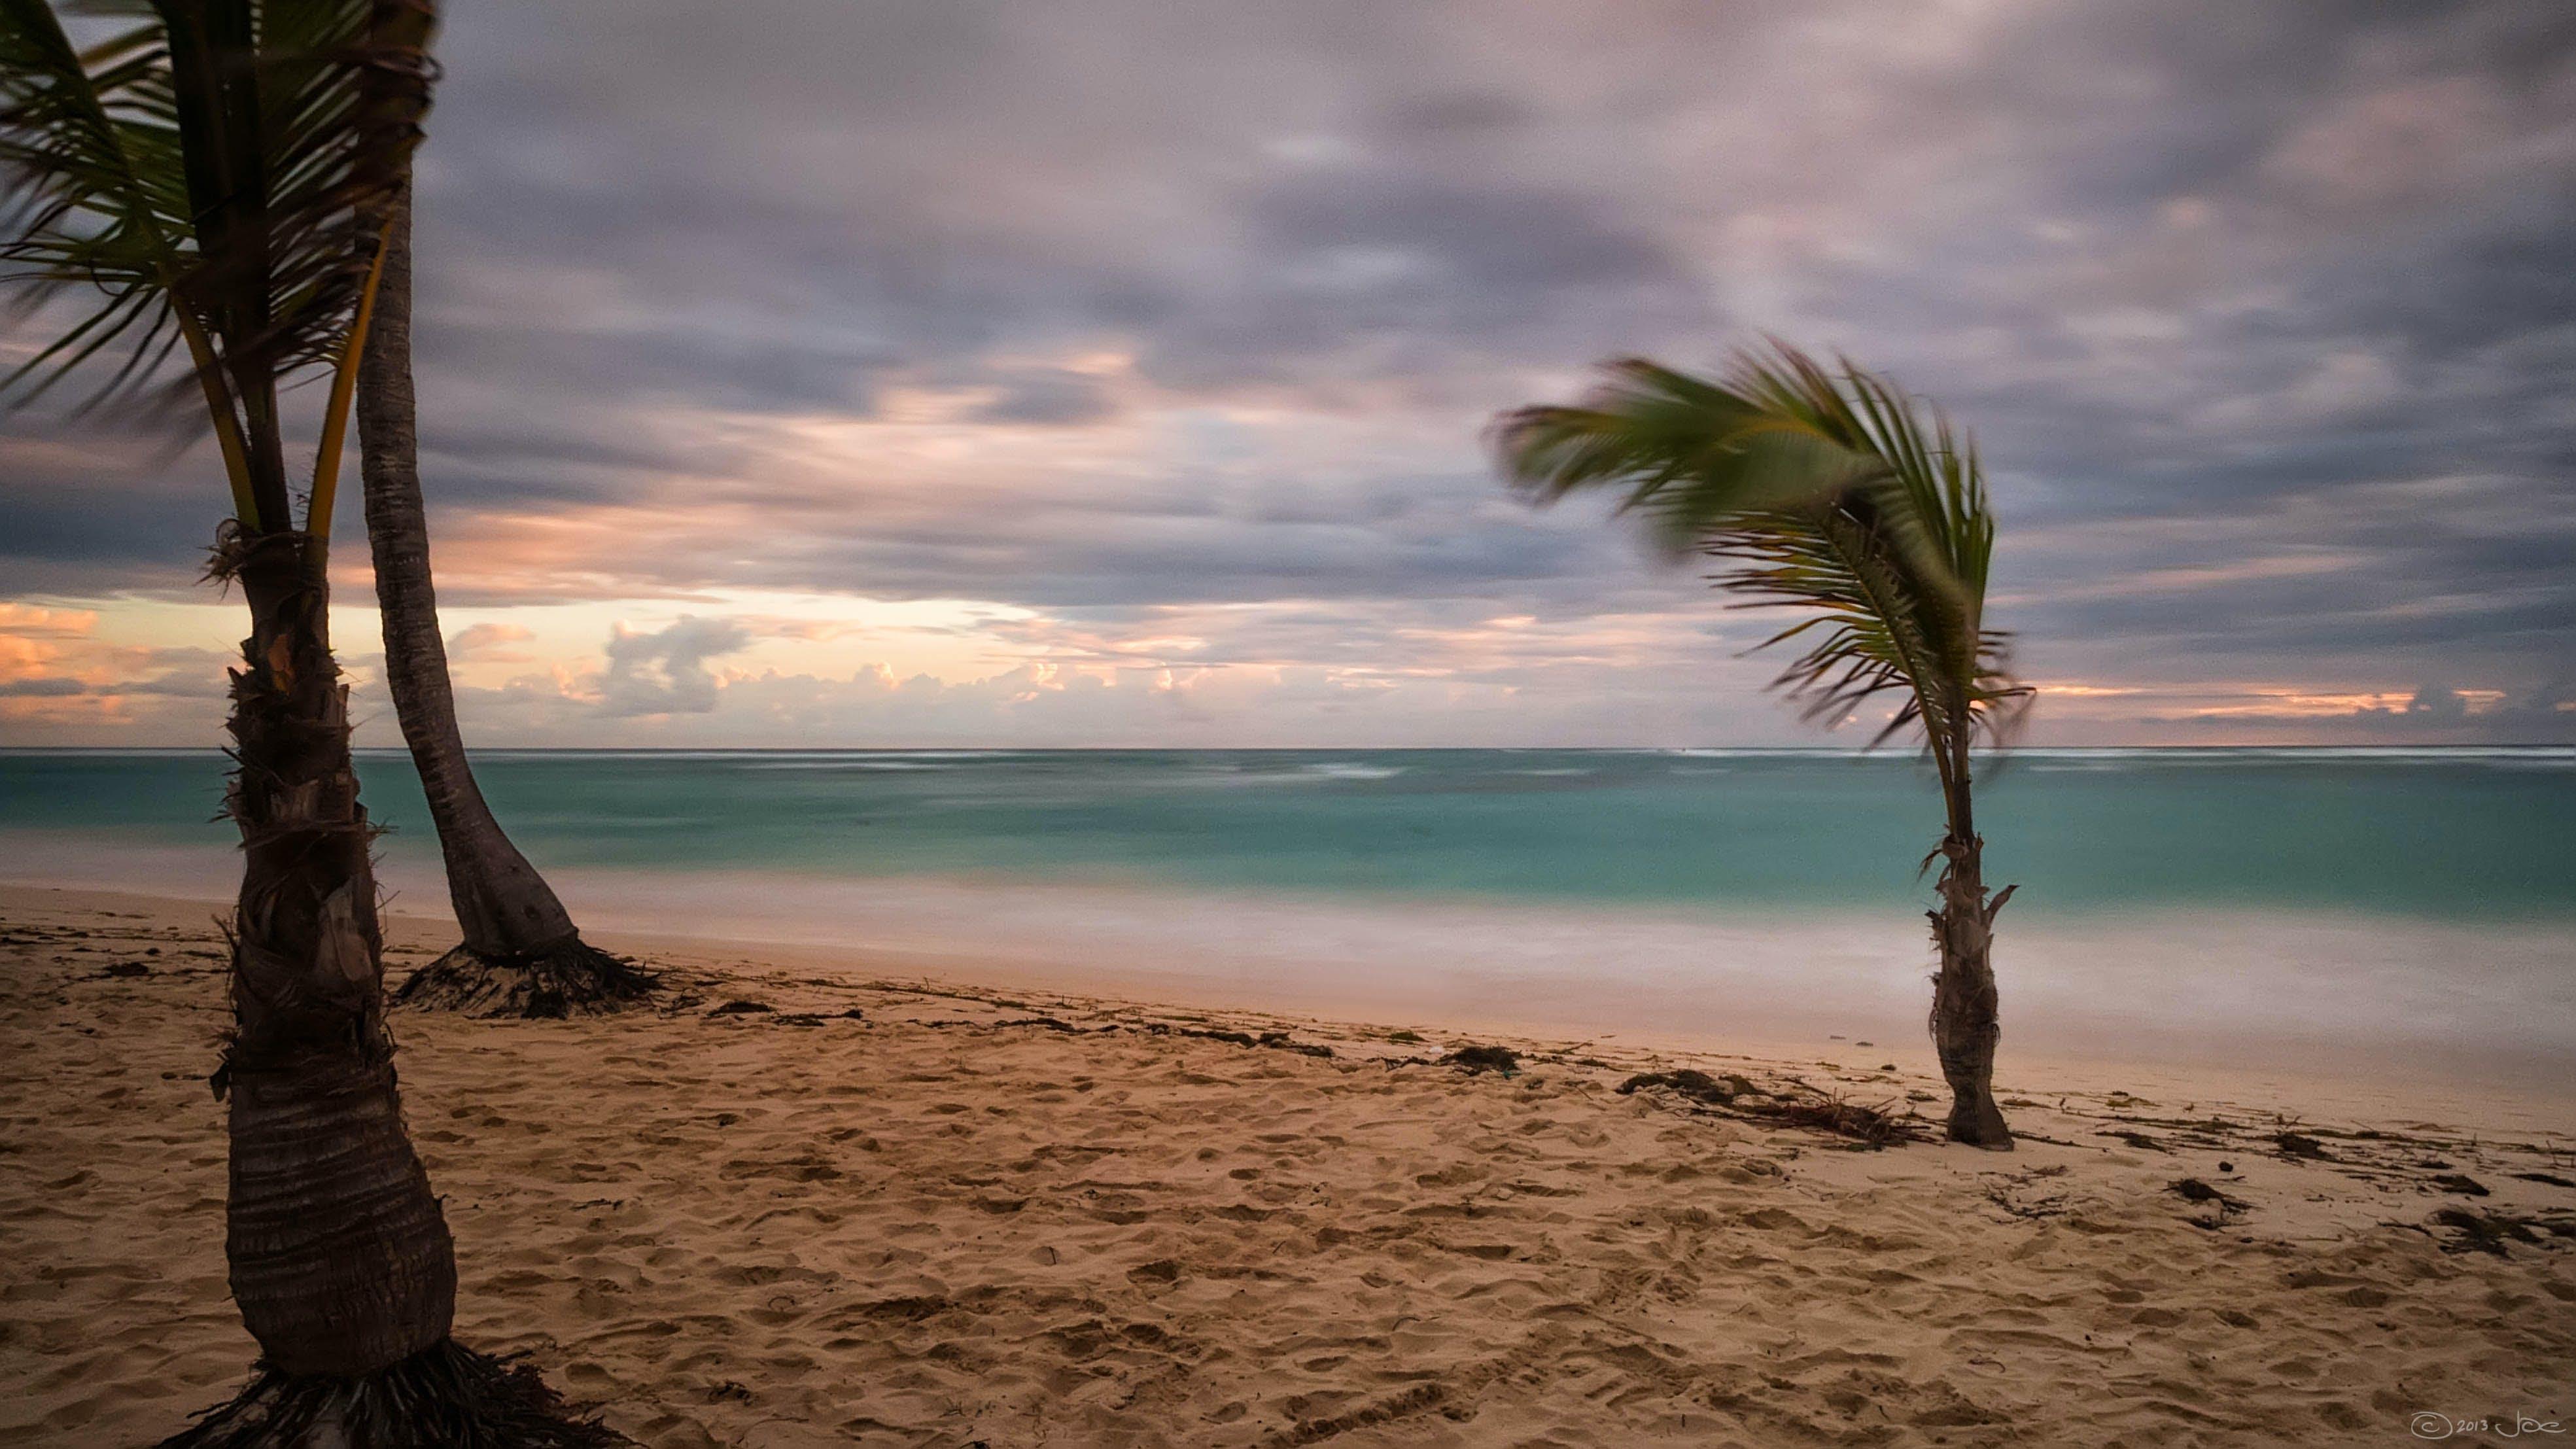 Green Palm Tree Near Body of Water